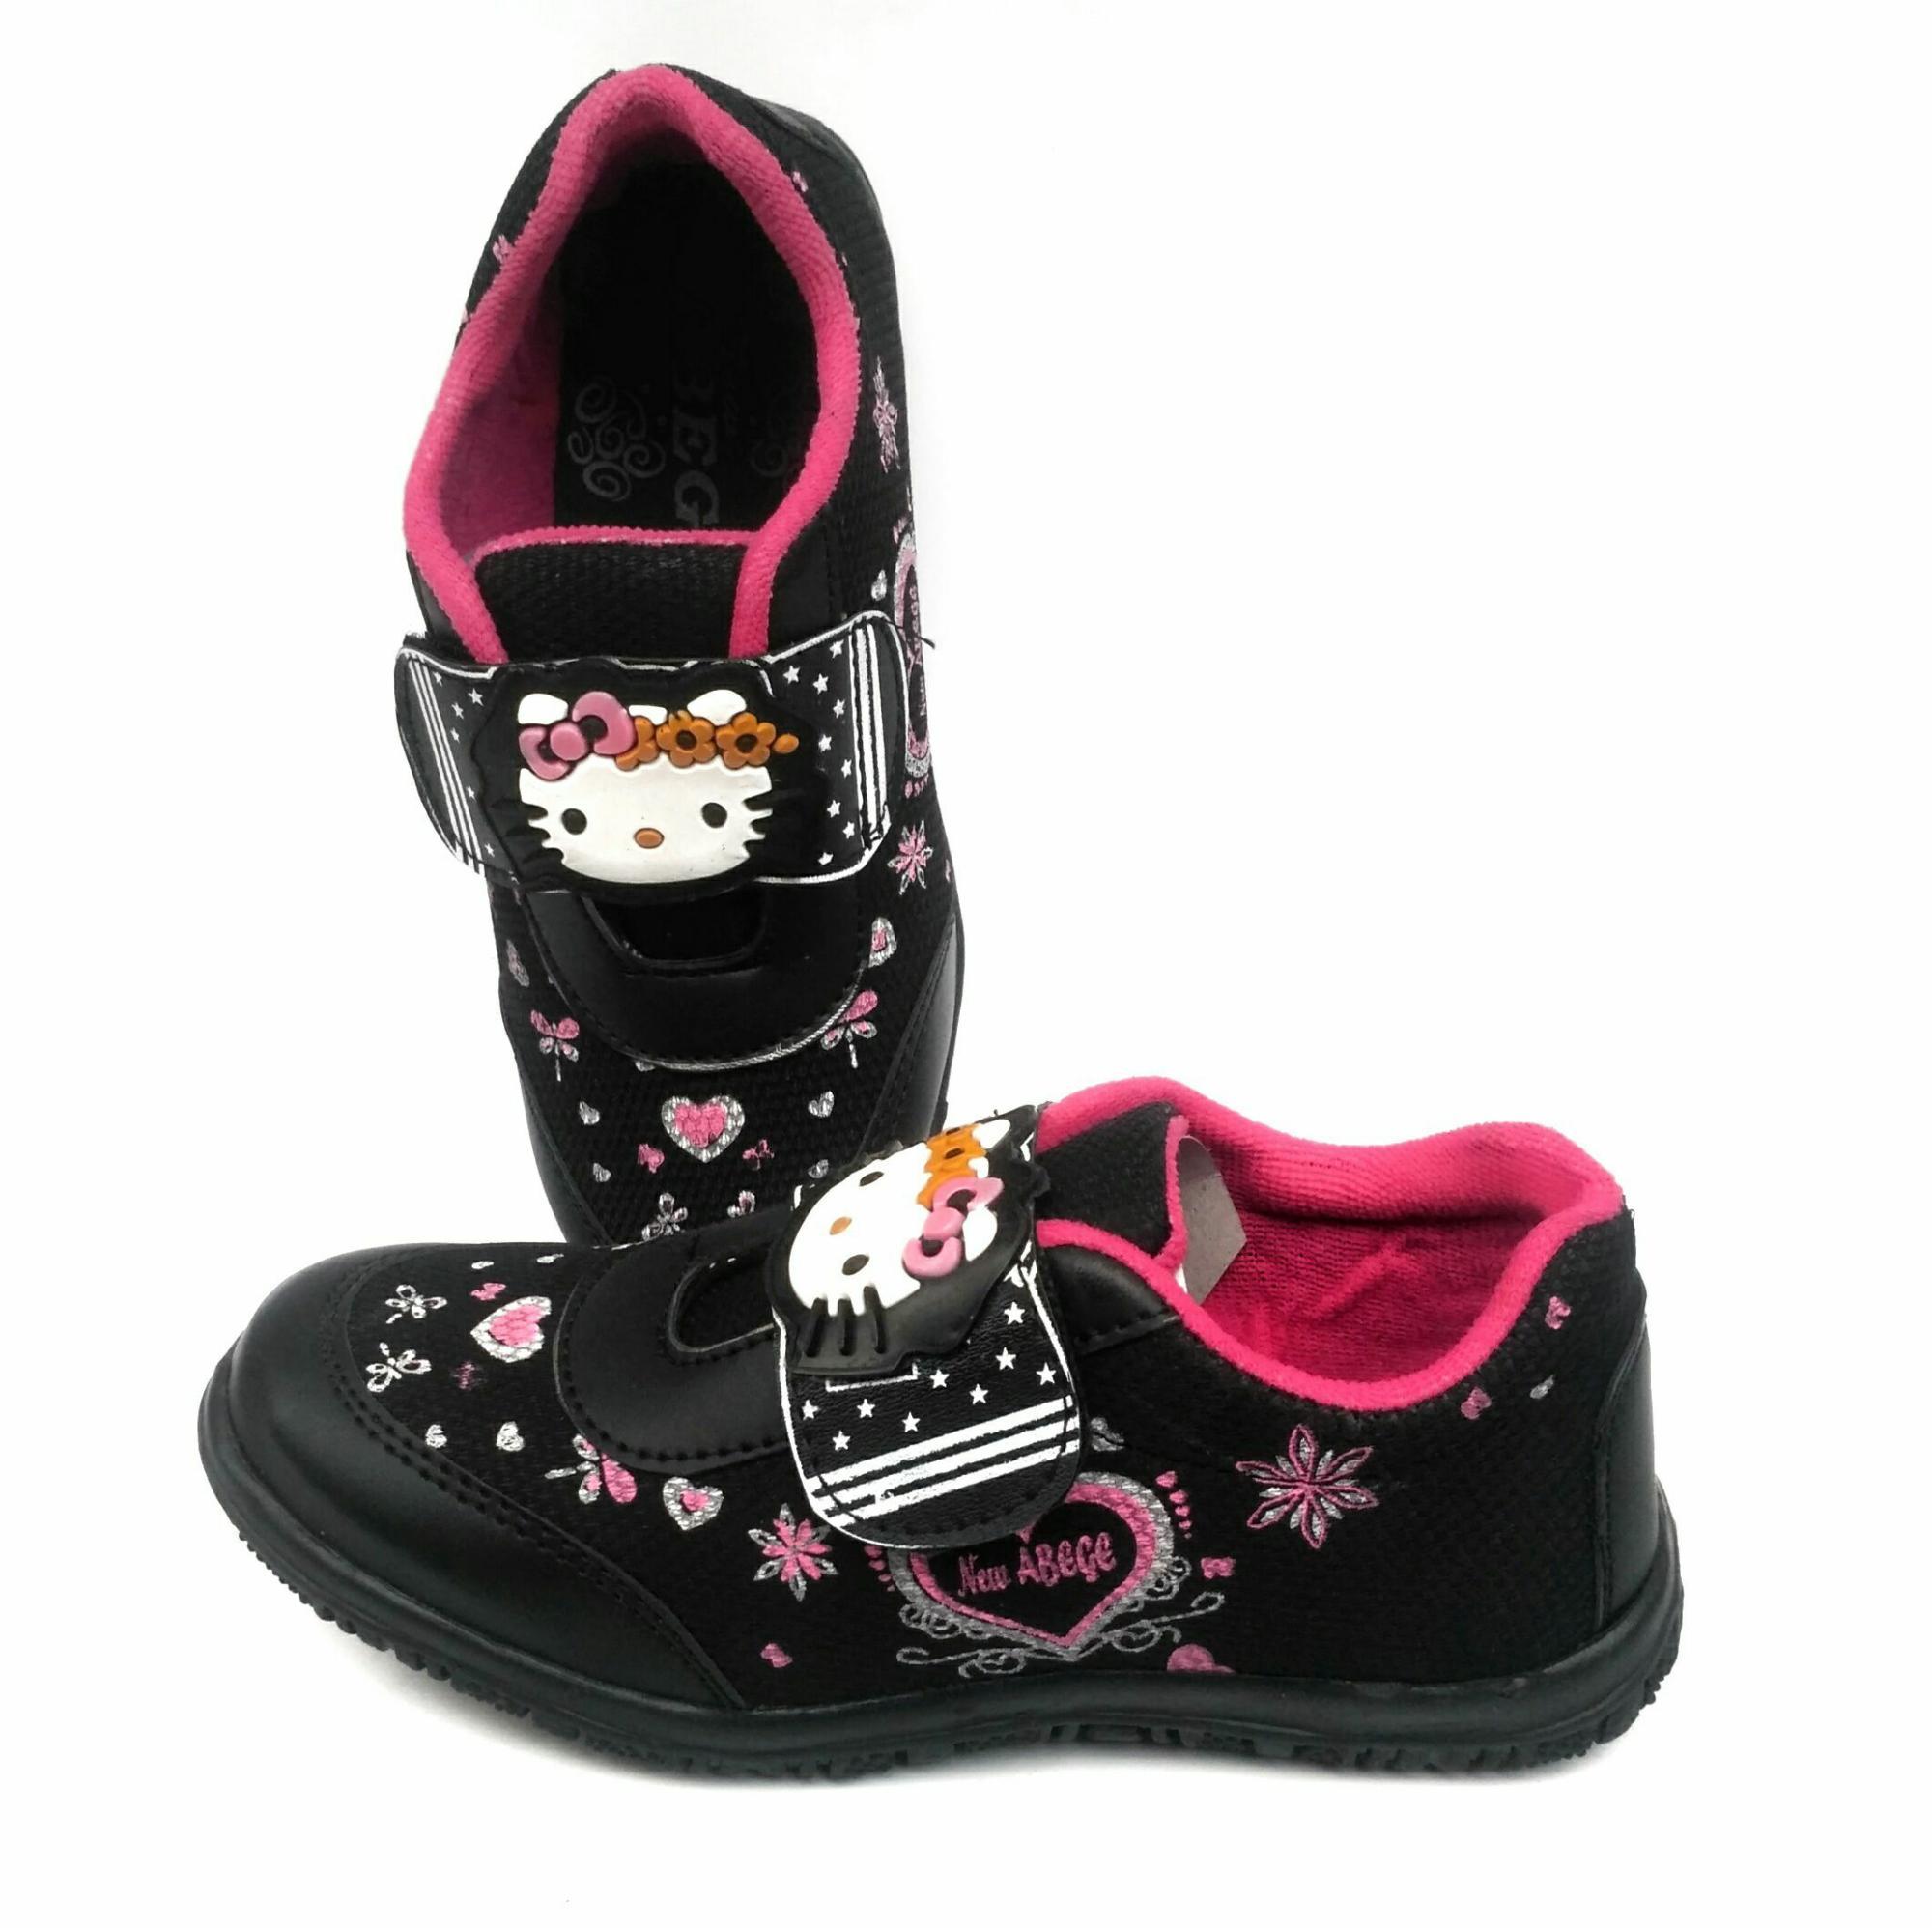 Fashion Anak Perempuan Jegging Size L 4 5 6 Tahun Jeging Celana Panjang Joger Sooko Sepatu Sekolah Sd Hello Kitty Hitam